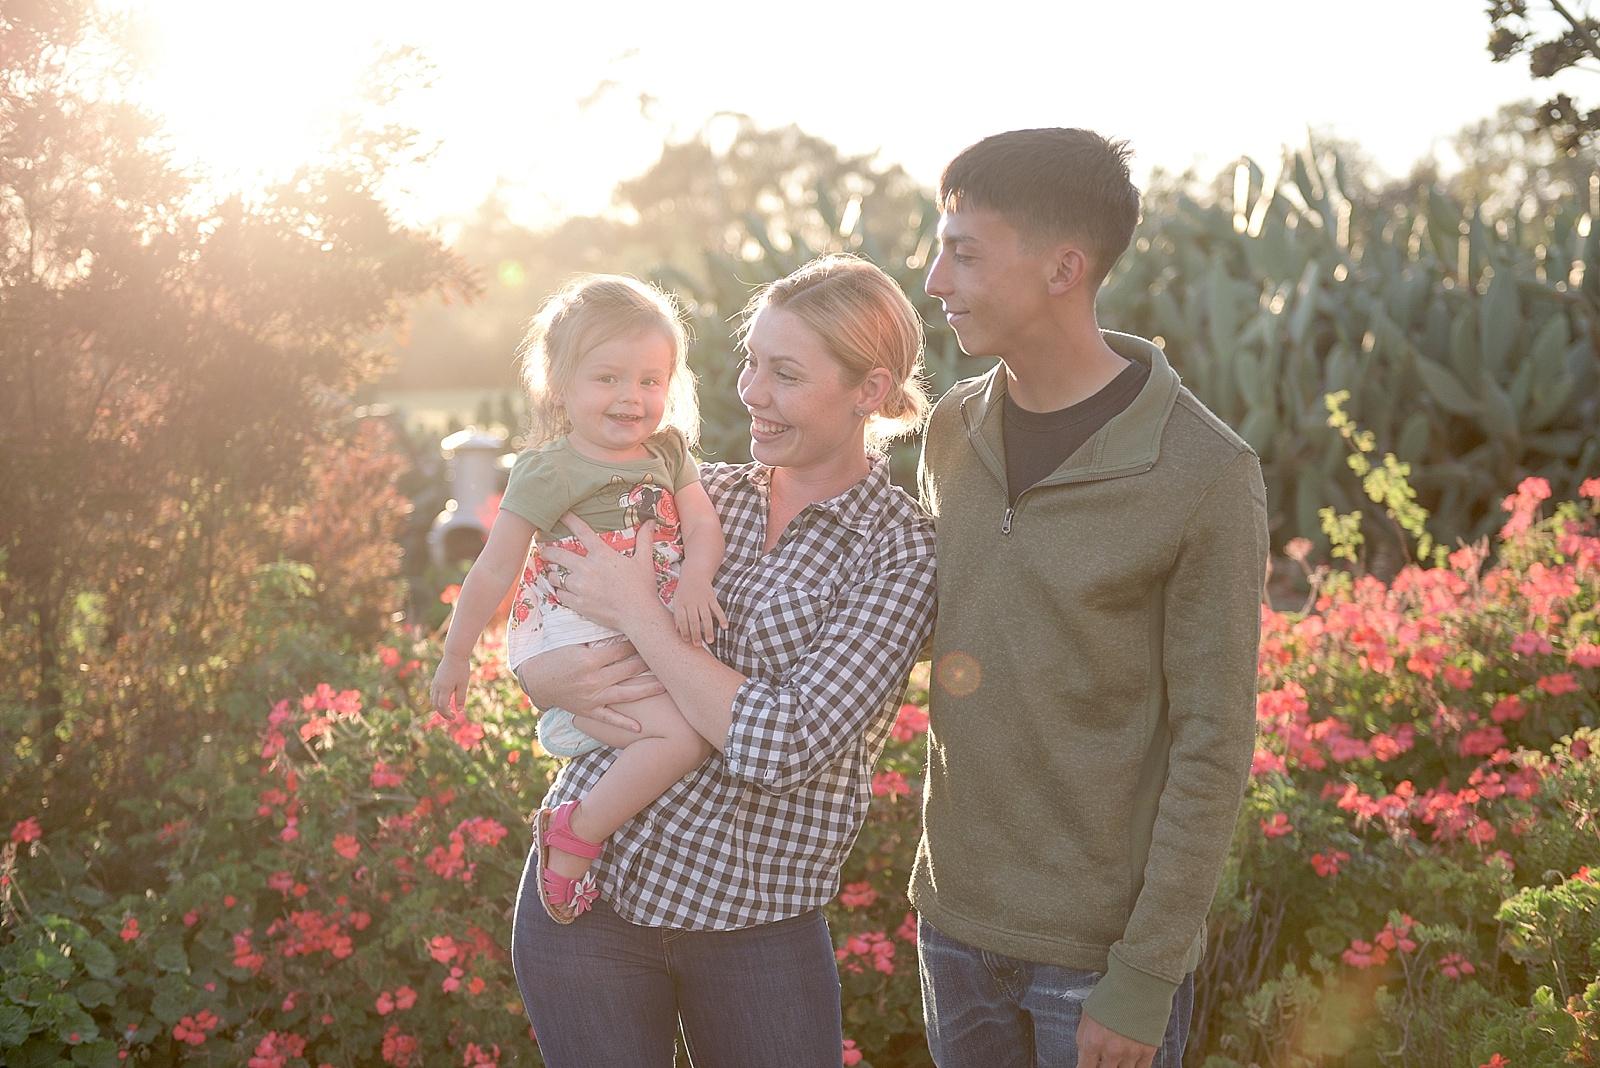 Rustic farm house family photo session from North Carolina family portrait photographer Lauren Nygard